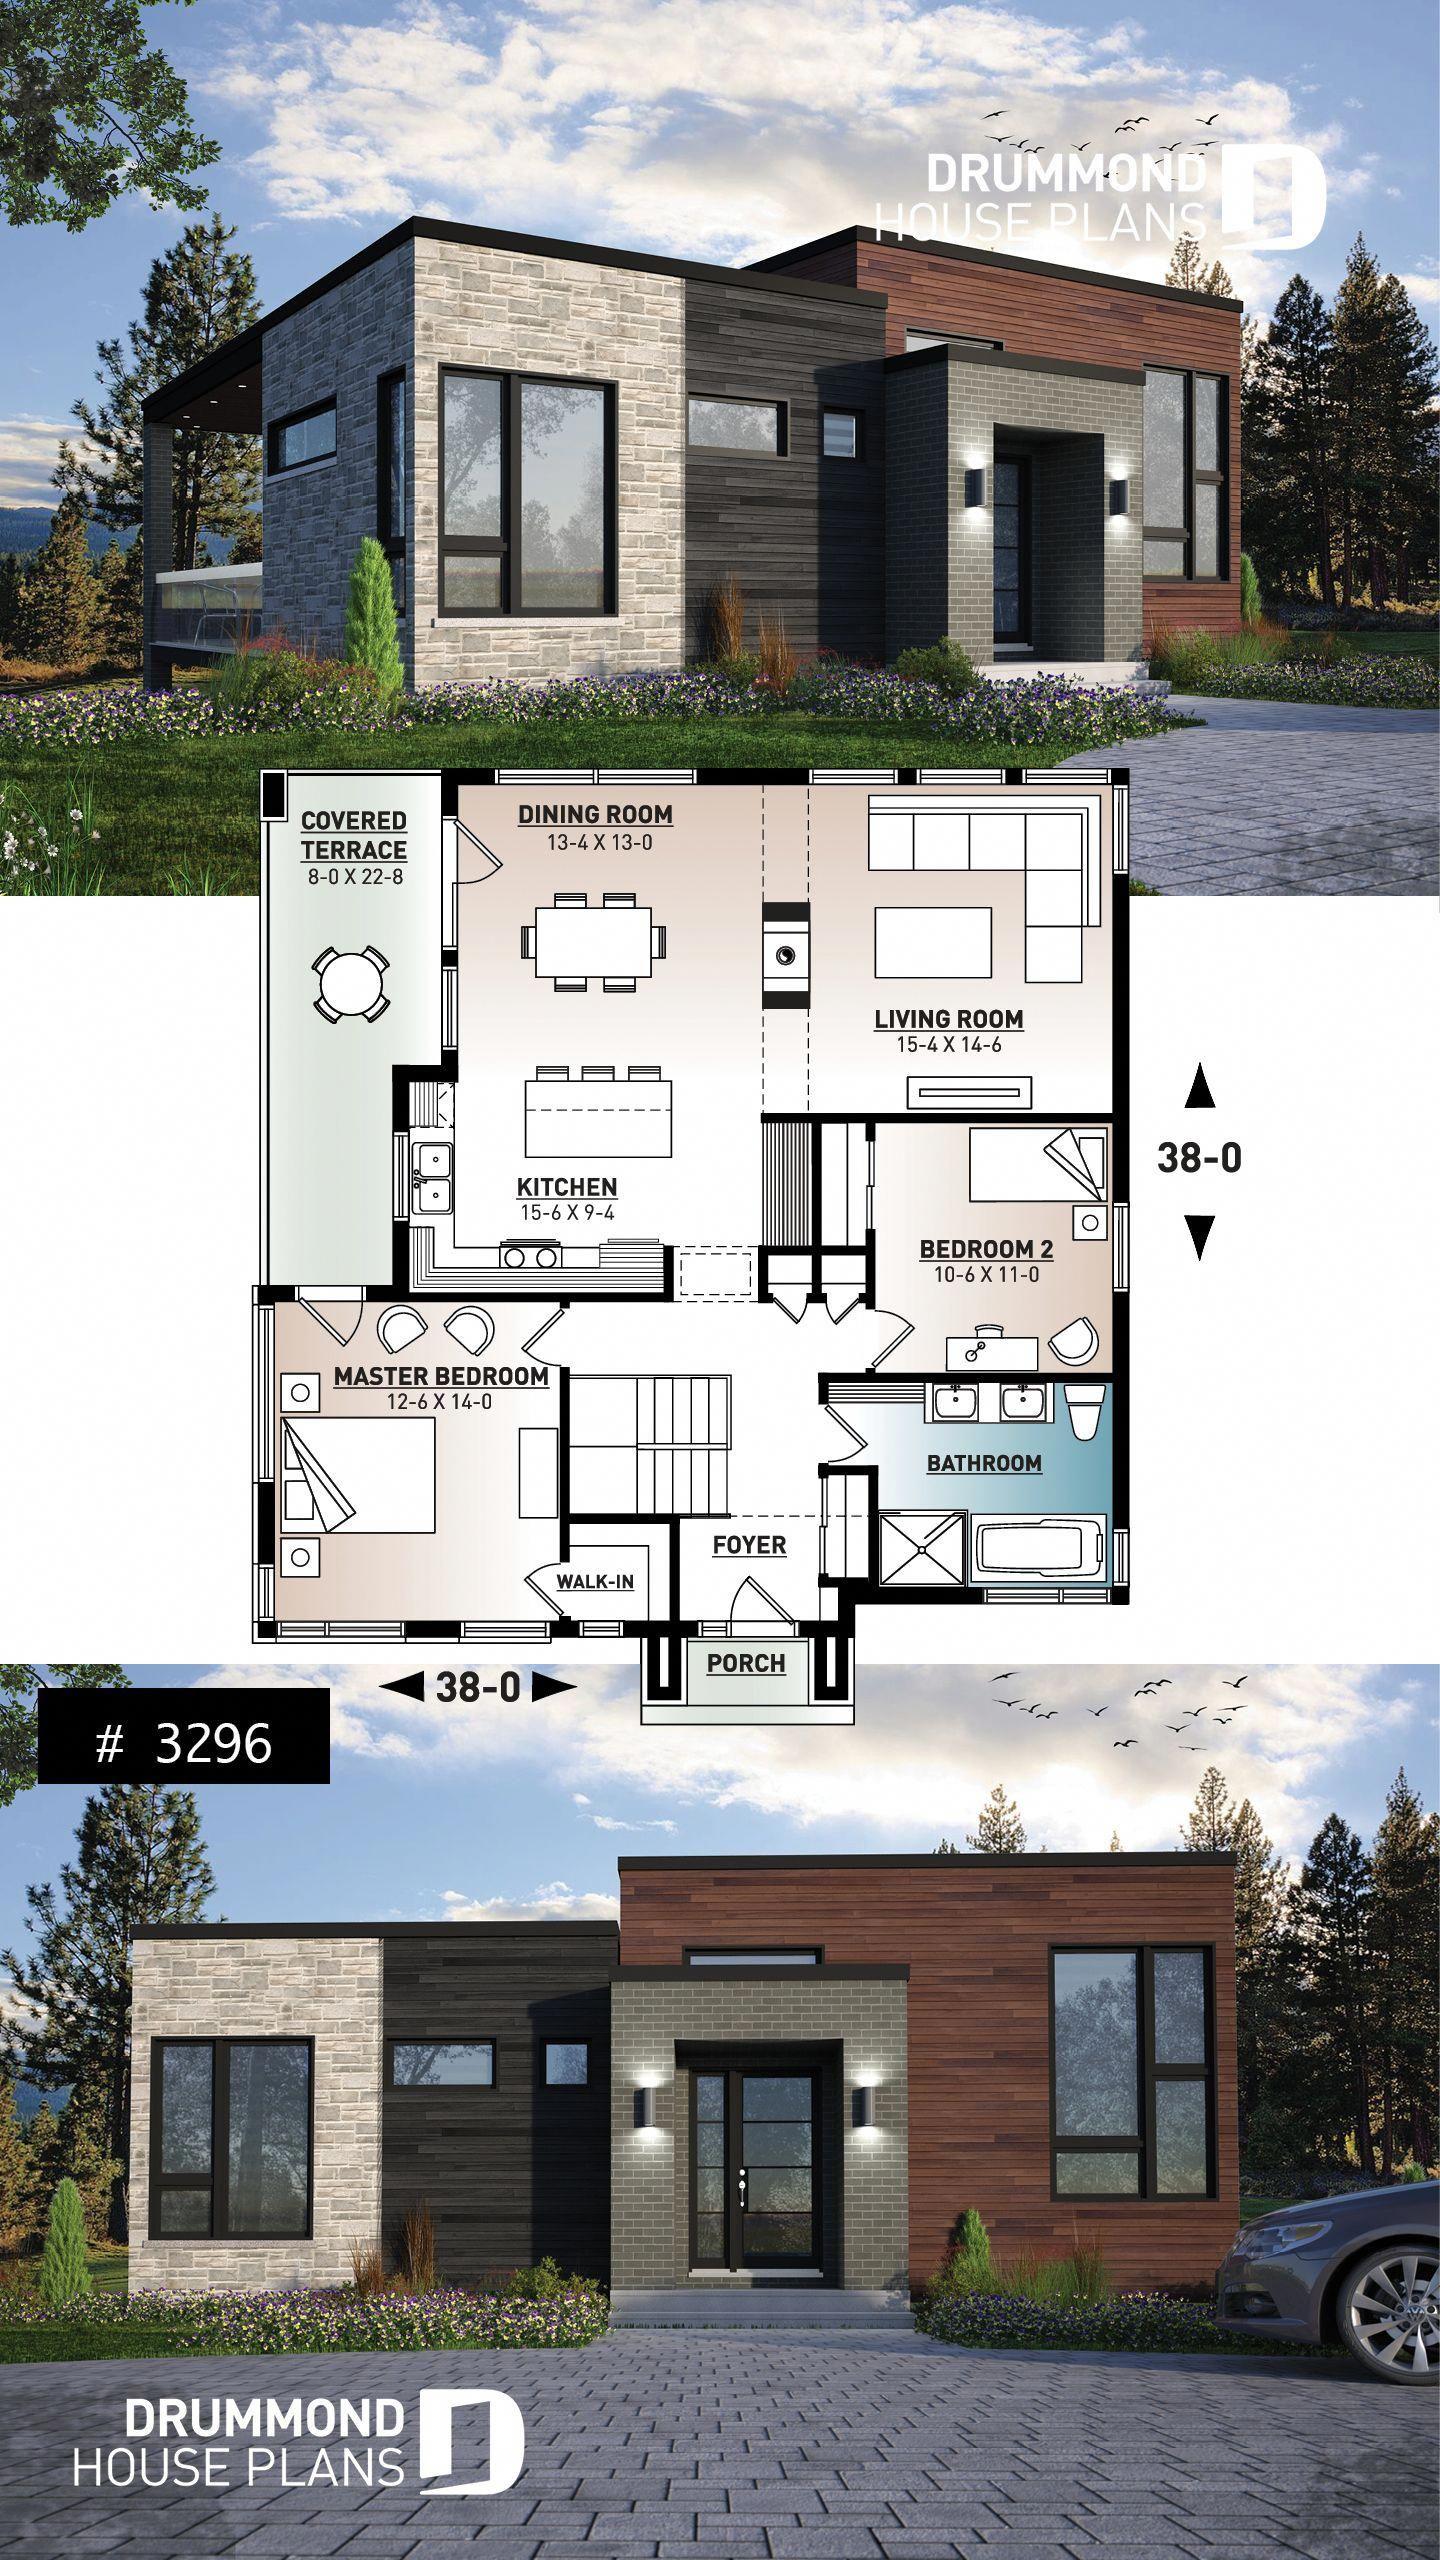 Dream House Ideas Dreamhouses Contemporary House Plans Modern House Floor Plans Basement House Plans